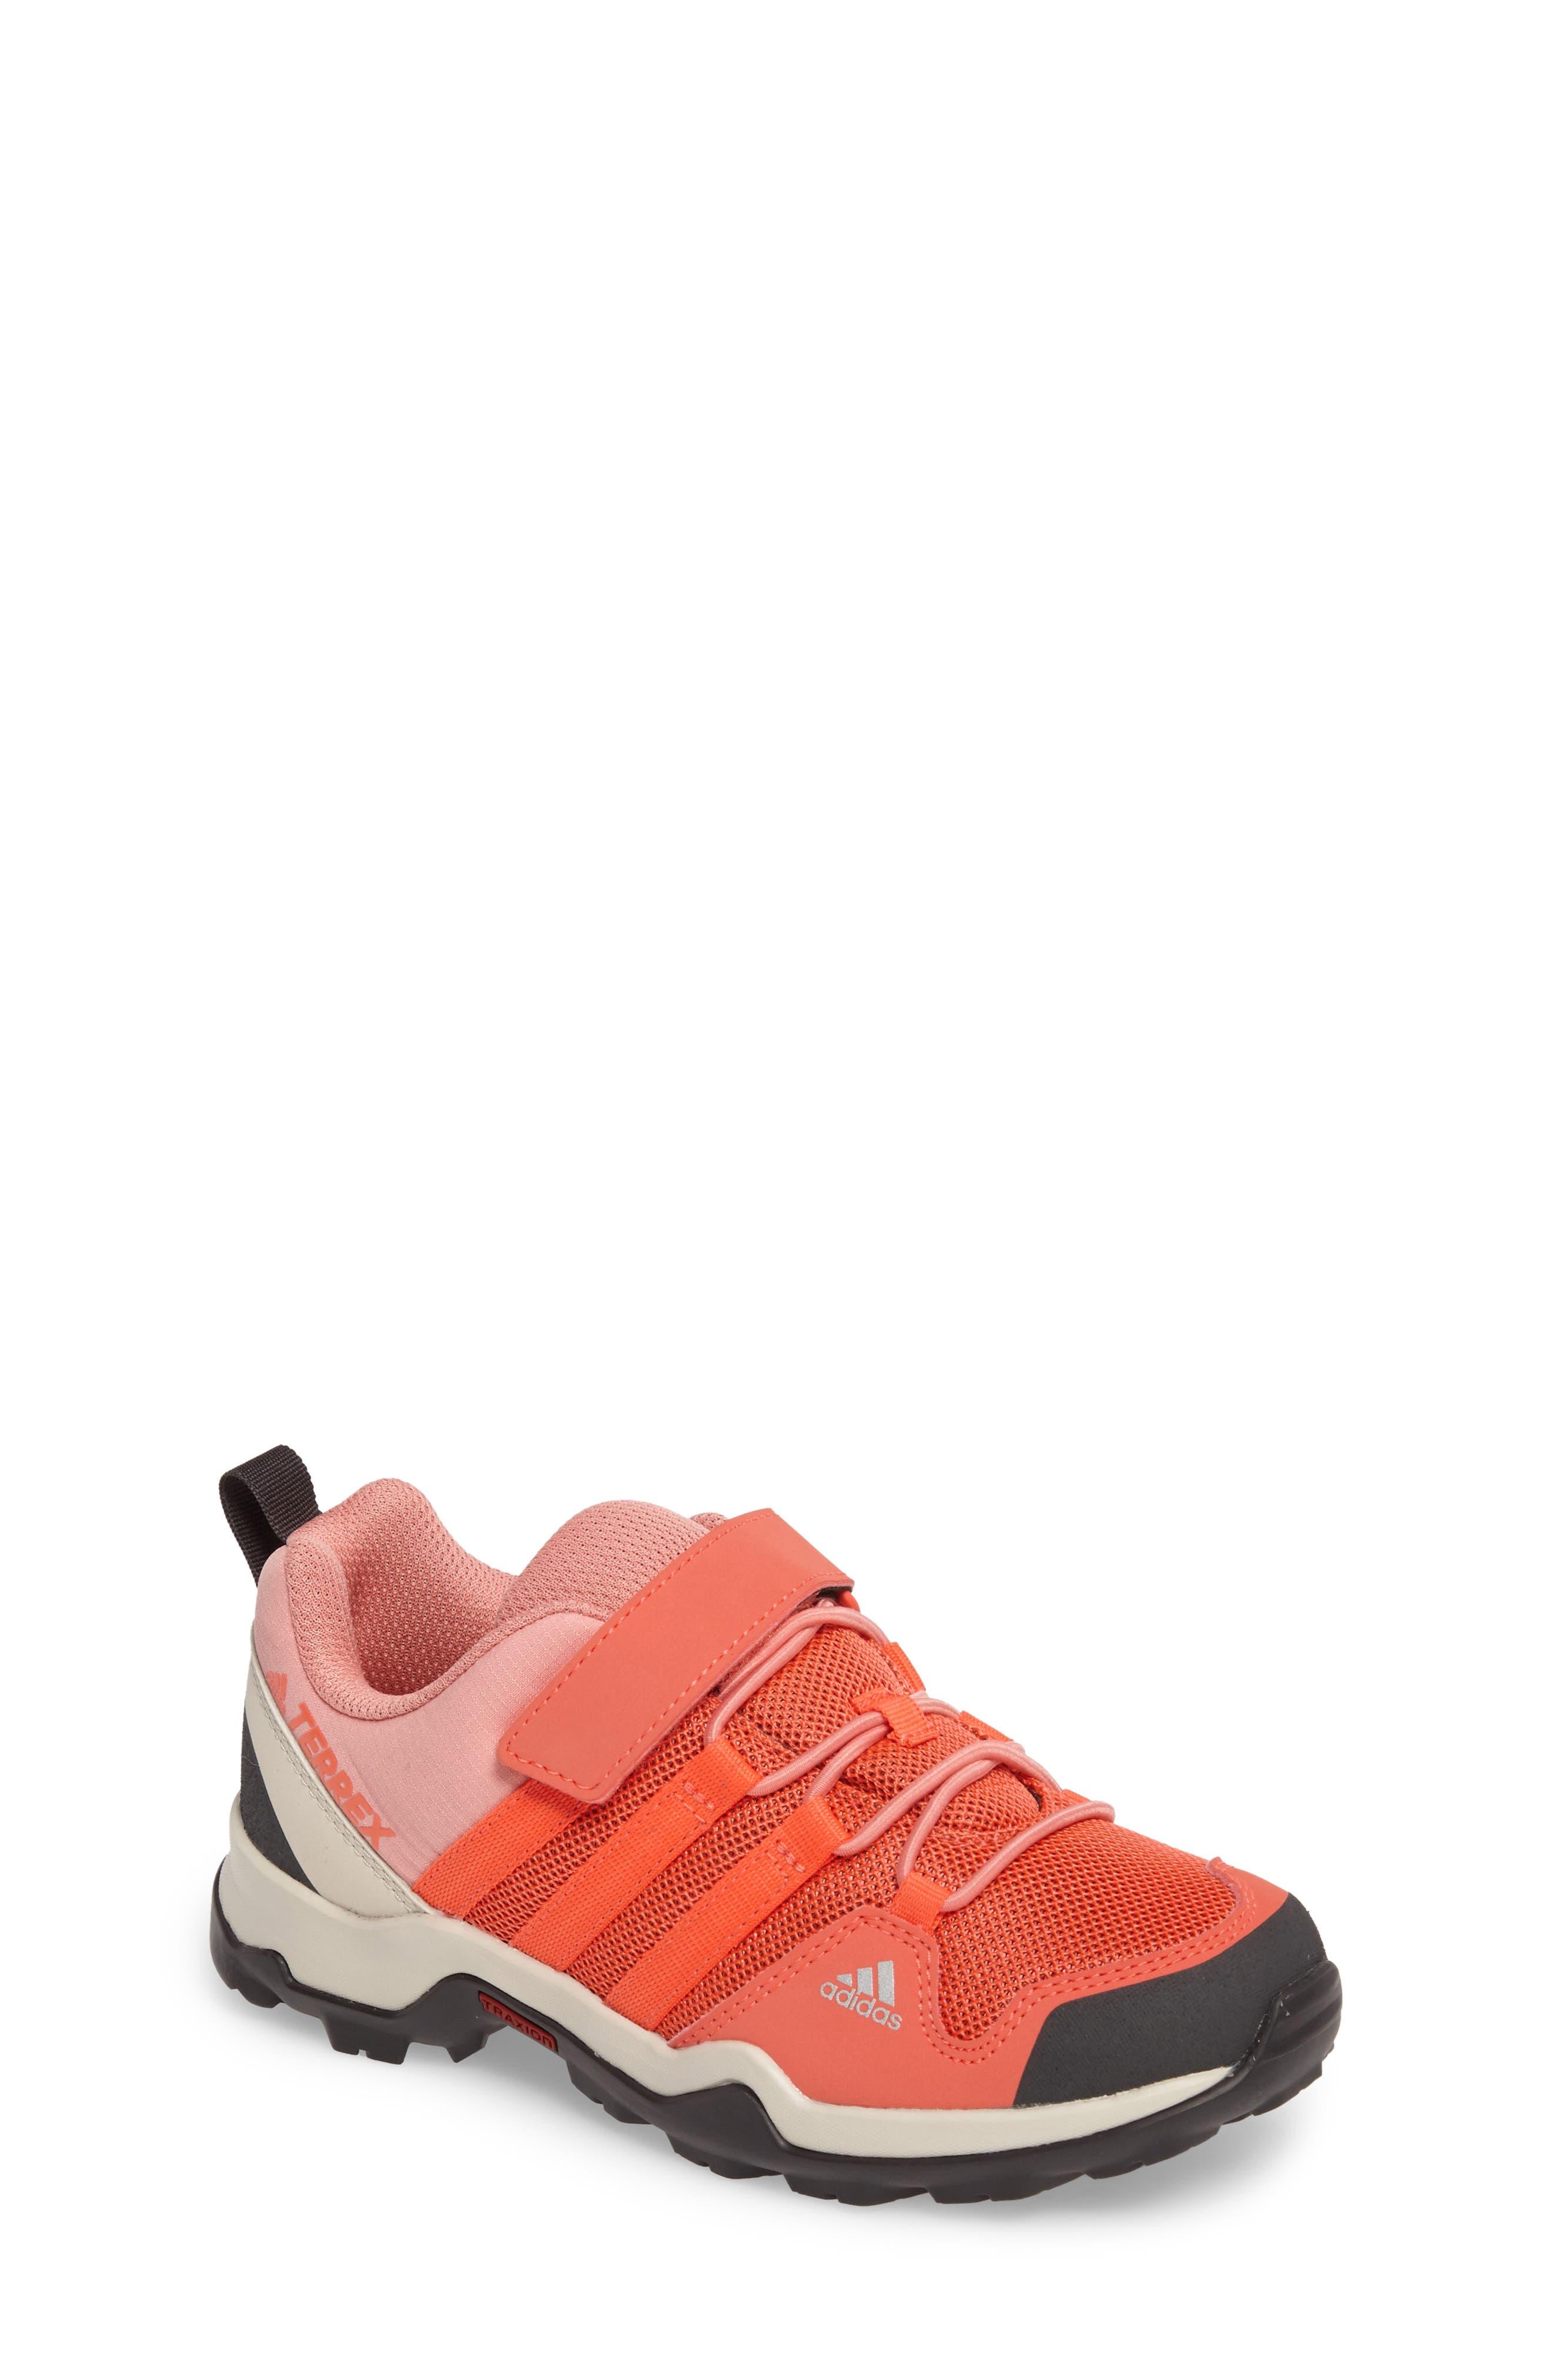 Terrex AX2R Sneaker,                             Main thumbnail 1, color,                             Easy Coral/ Tactile Rose